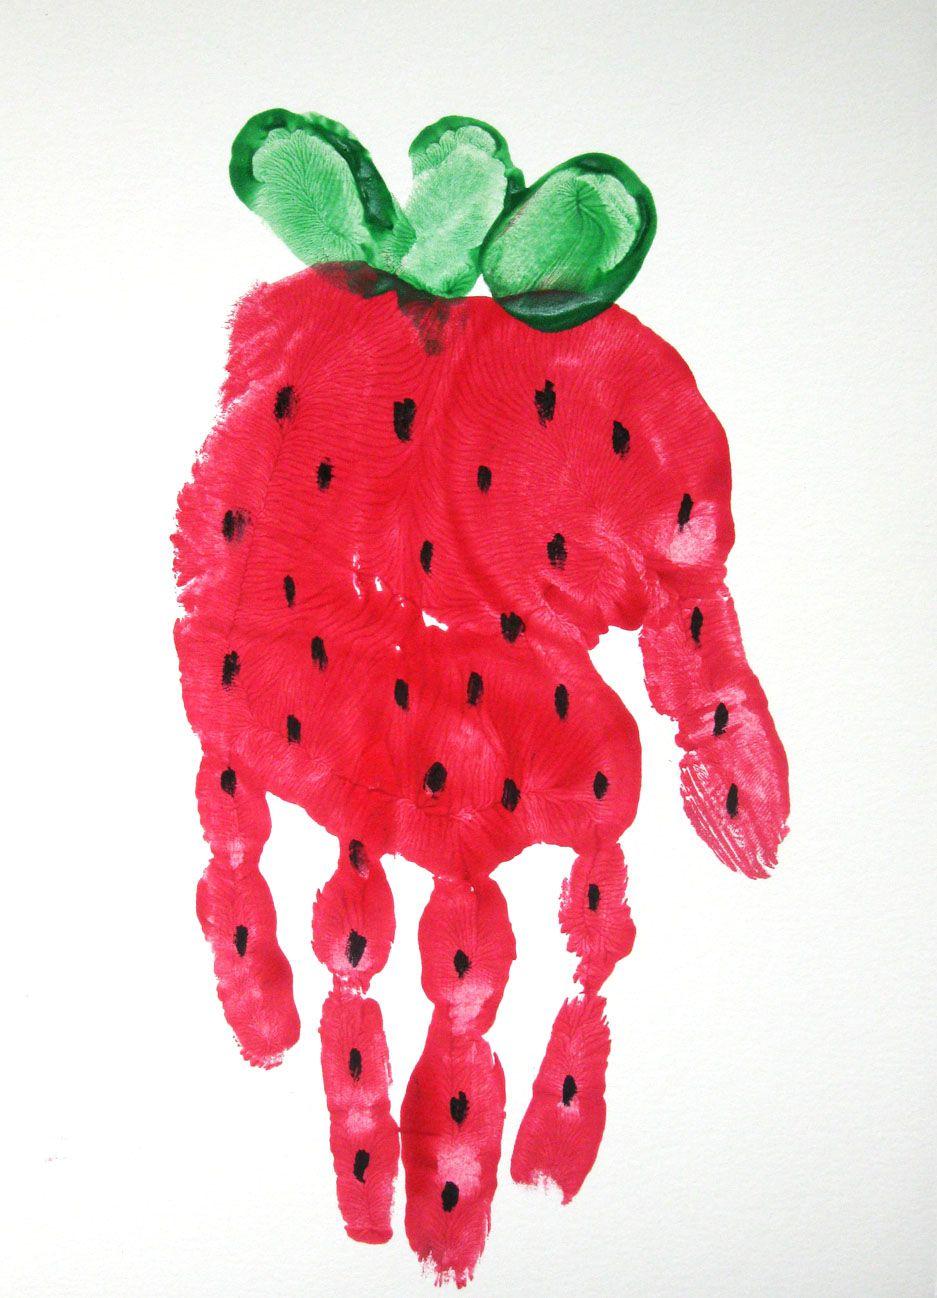 Strawberry Handprint Daycare CraftsPreschool